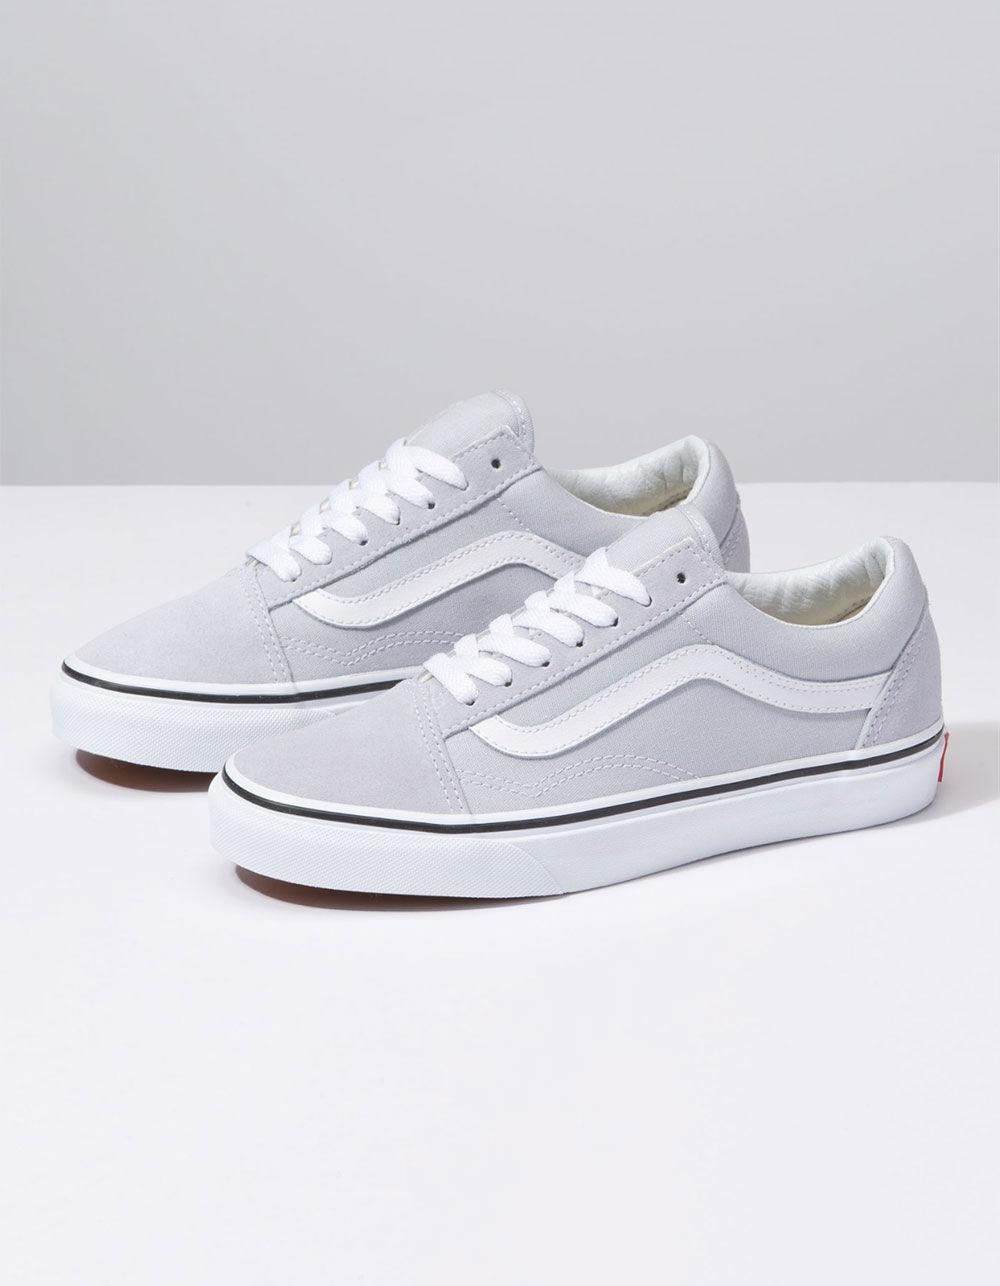 49b4f0d2ebc Lyst - Vans Old Skool Gray Dawn   True White Womens Shoes in White